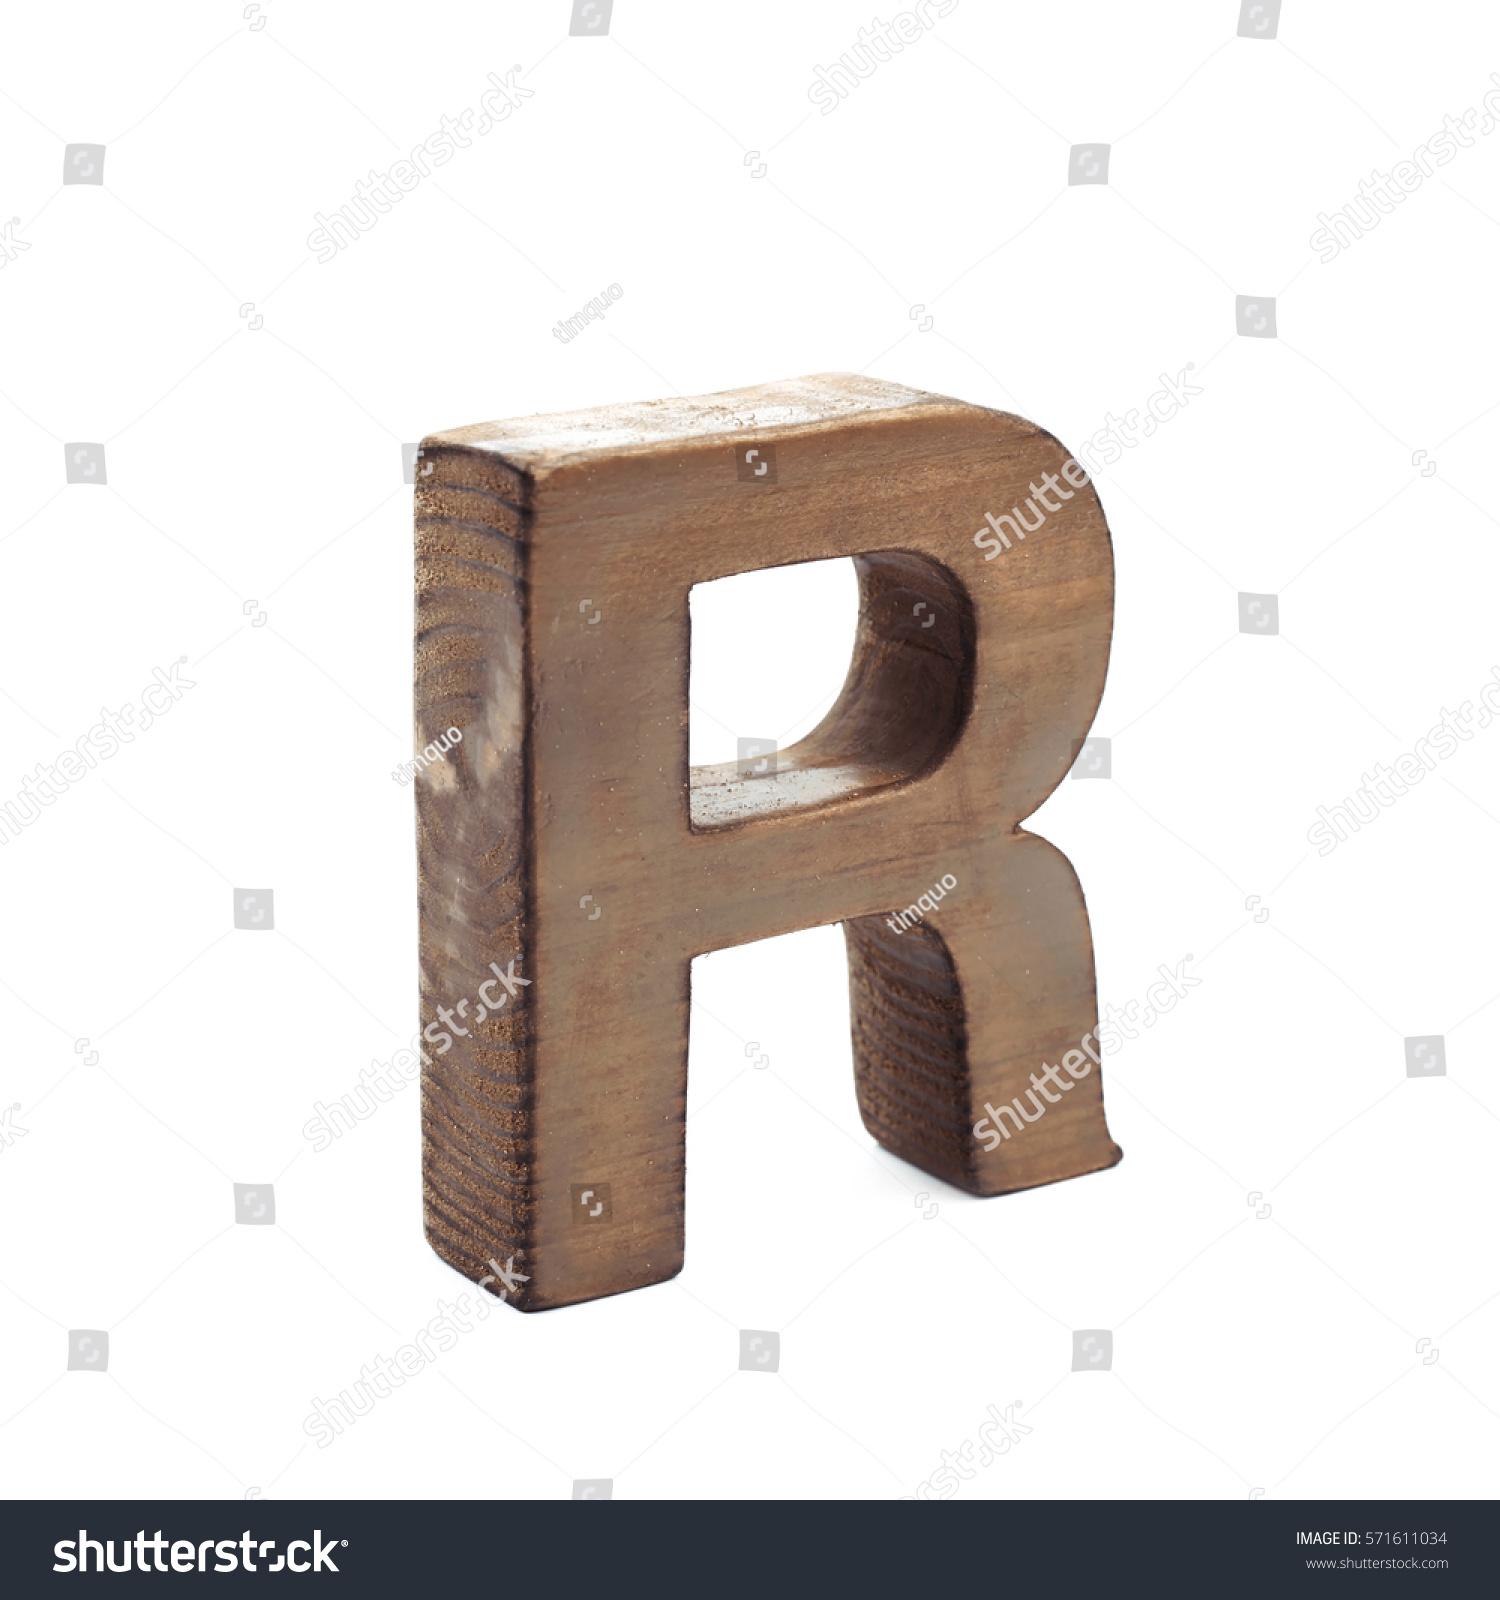 Single sawn wooden letter r symbol stock photo 571611034 single sawn wooden letter r symbol coated with paint isolated over the white background buycottarizona